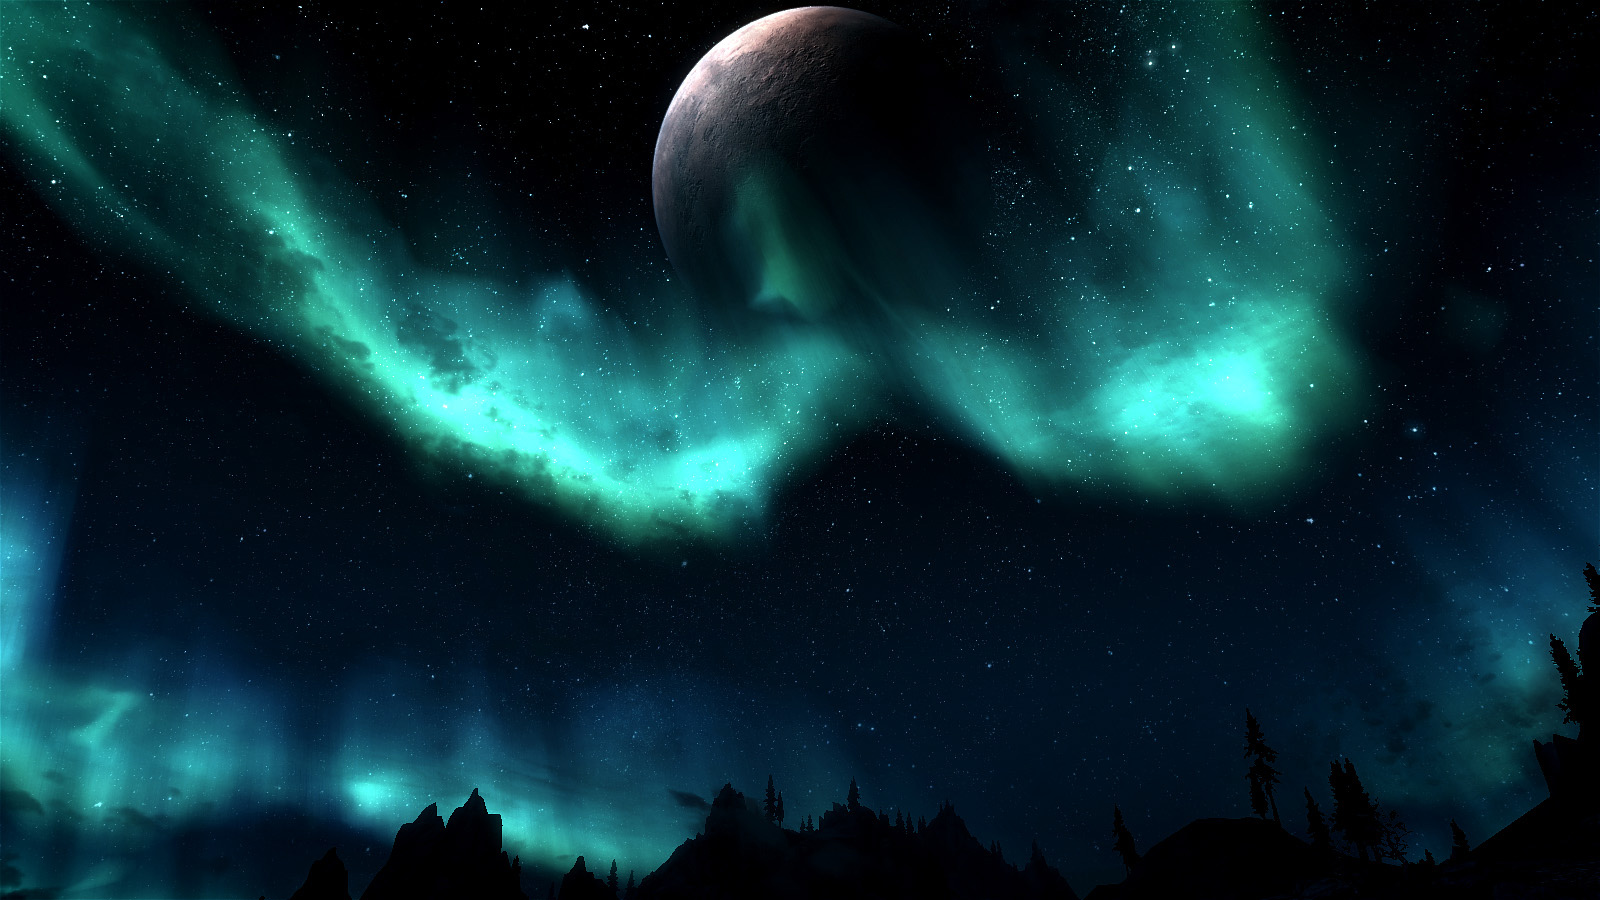 Skyrim NightSky Lights   Desktop Wallpaper 1600x900